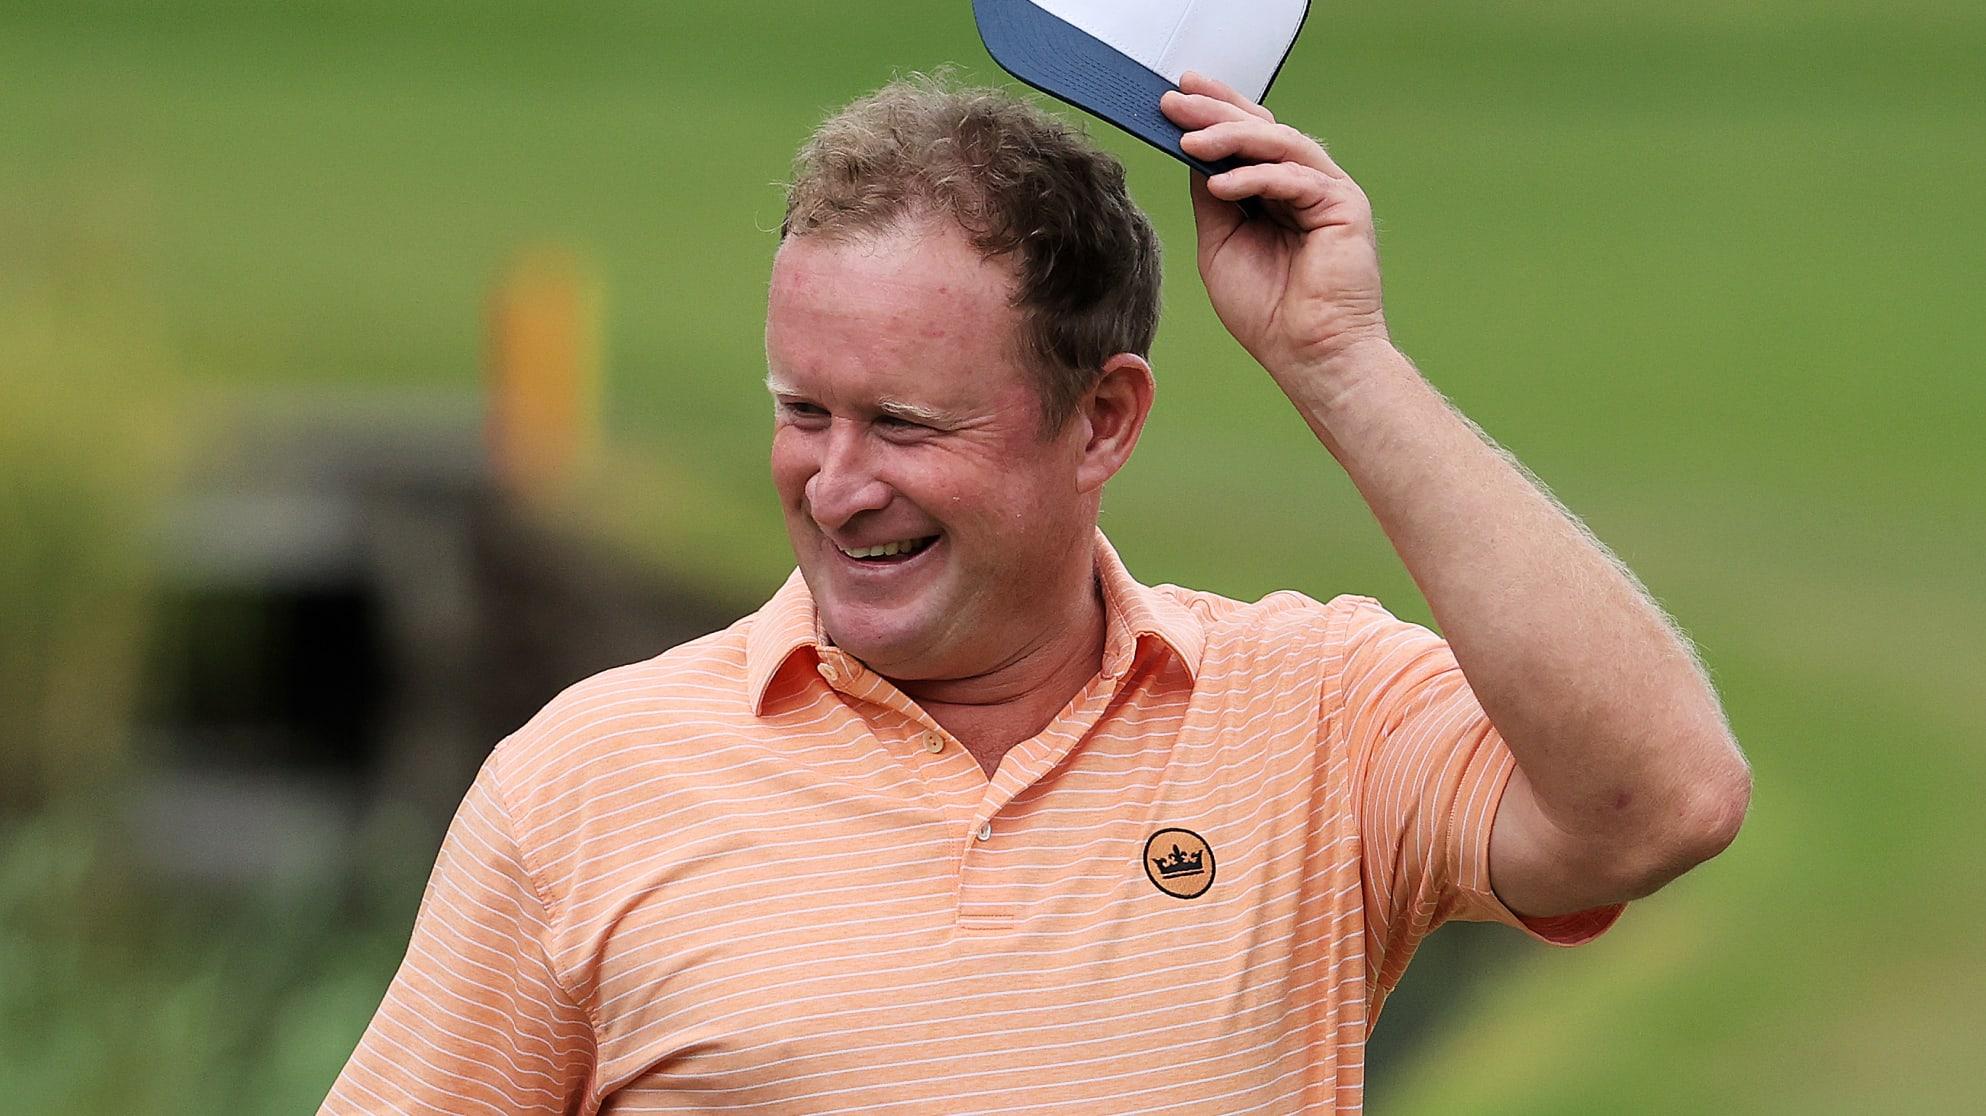 Jamie Donaldson là golfer đầu tiên sau 18 năm lập hattrick eagle tại BMW PGA Championship. Ảnh: European Tour